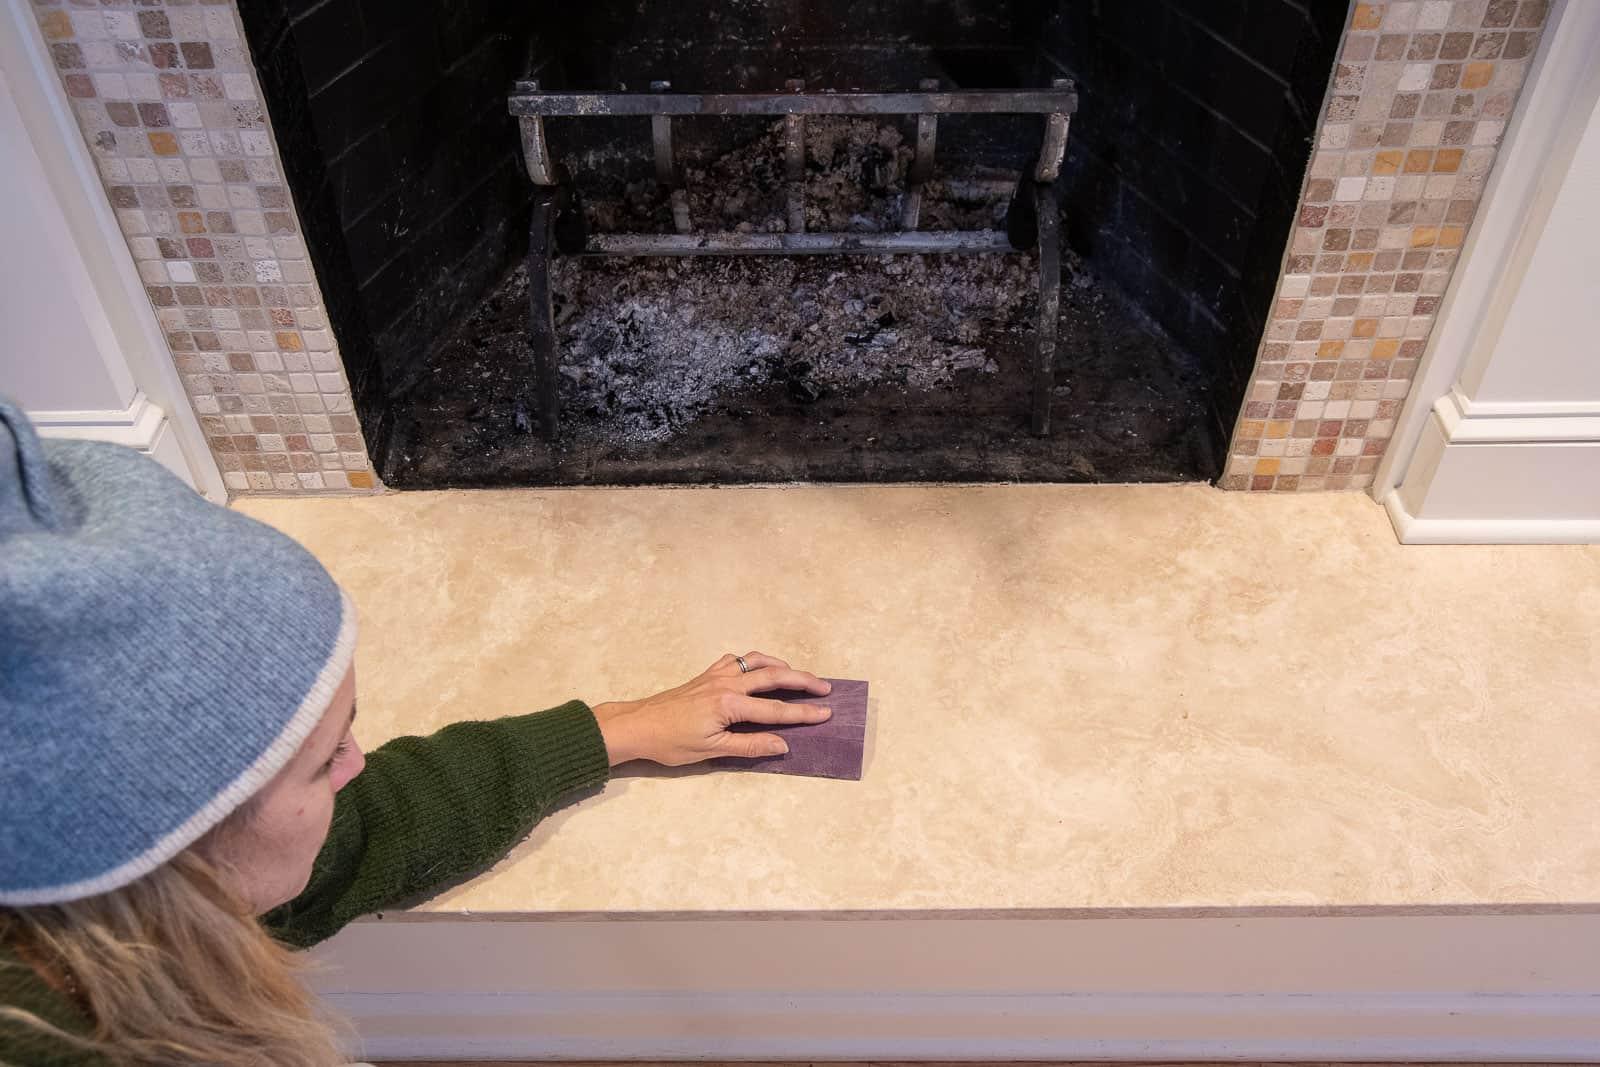 lightly sand the tile